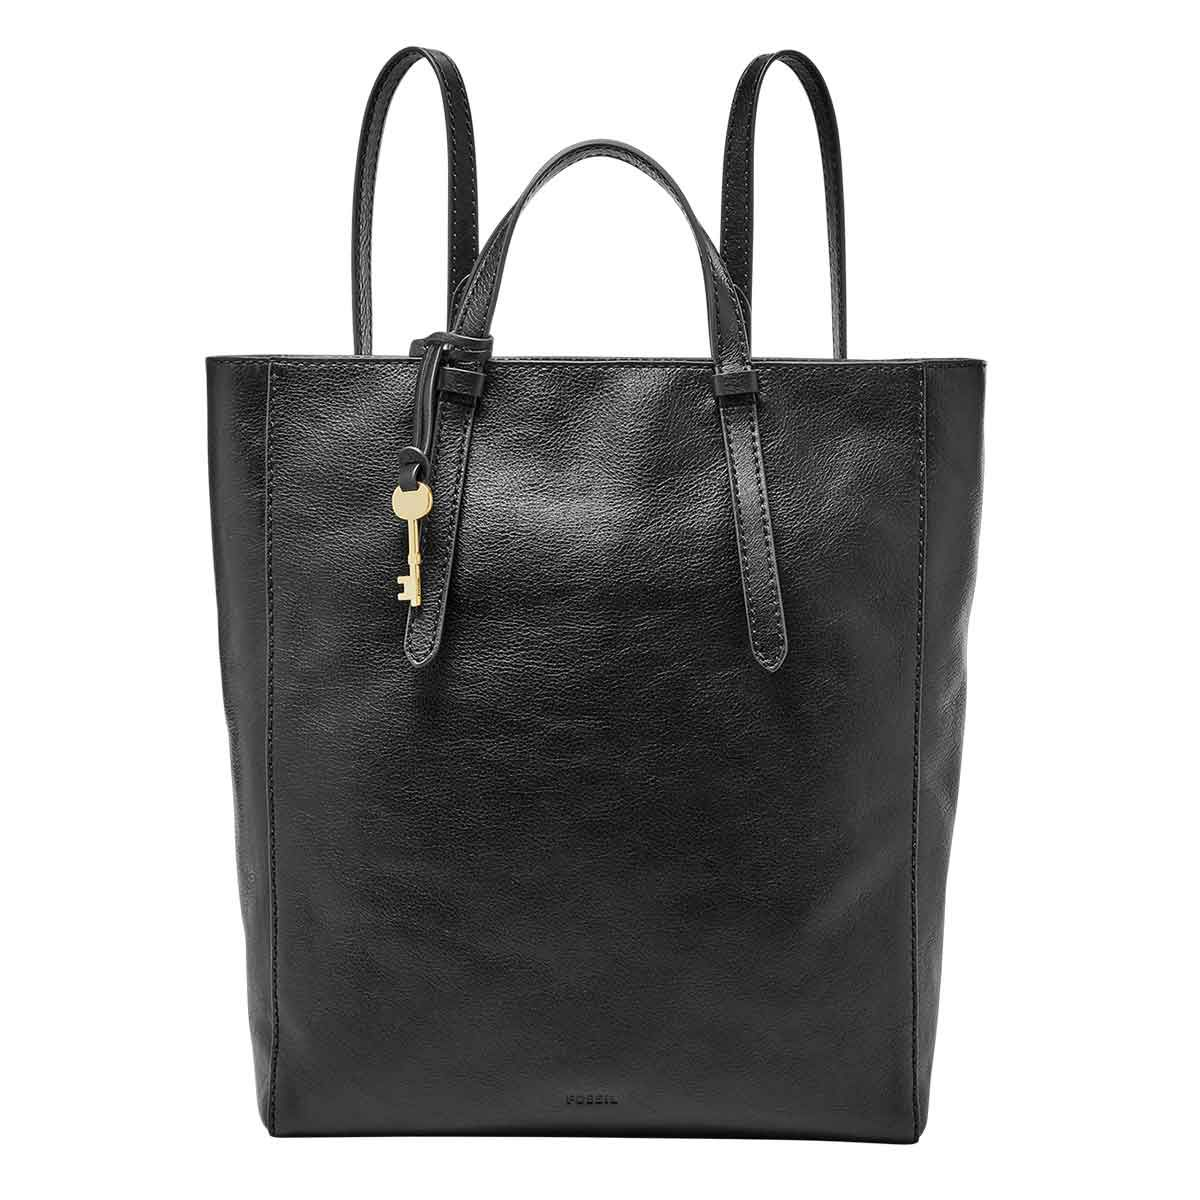 4486fceb0ae7 Fossil Handbags & Purses - Macy's